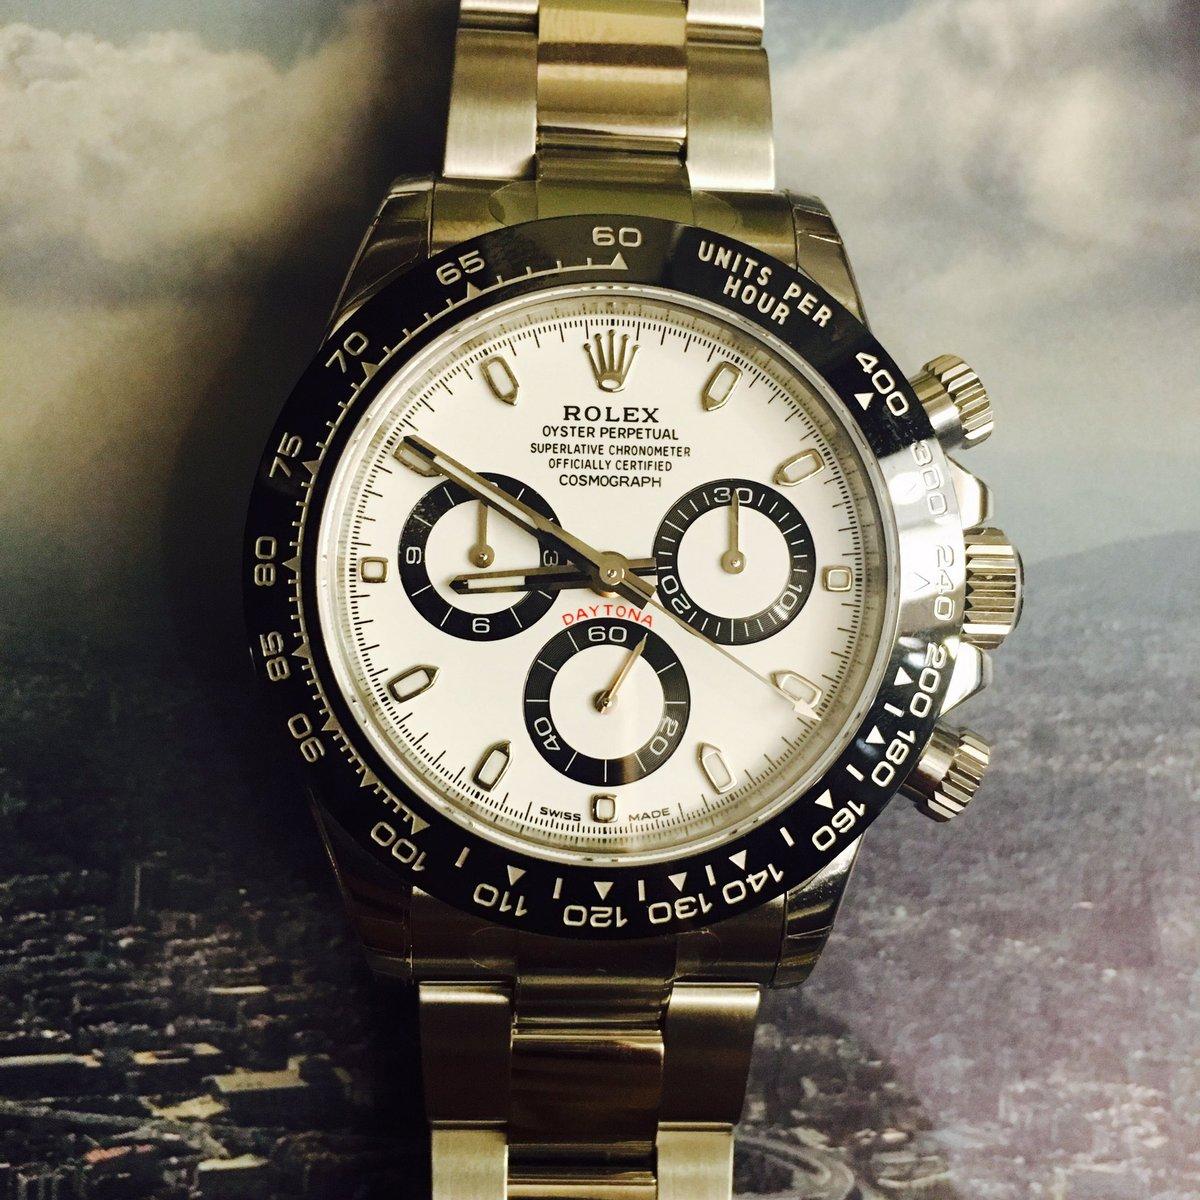 new concept b3603 de6a0 高級腕時計専門店 BELLE MONDE on Twitter: